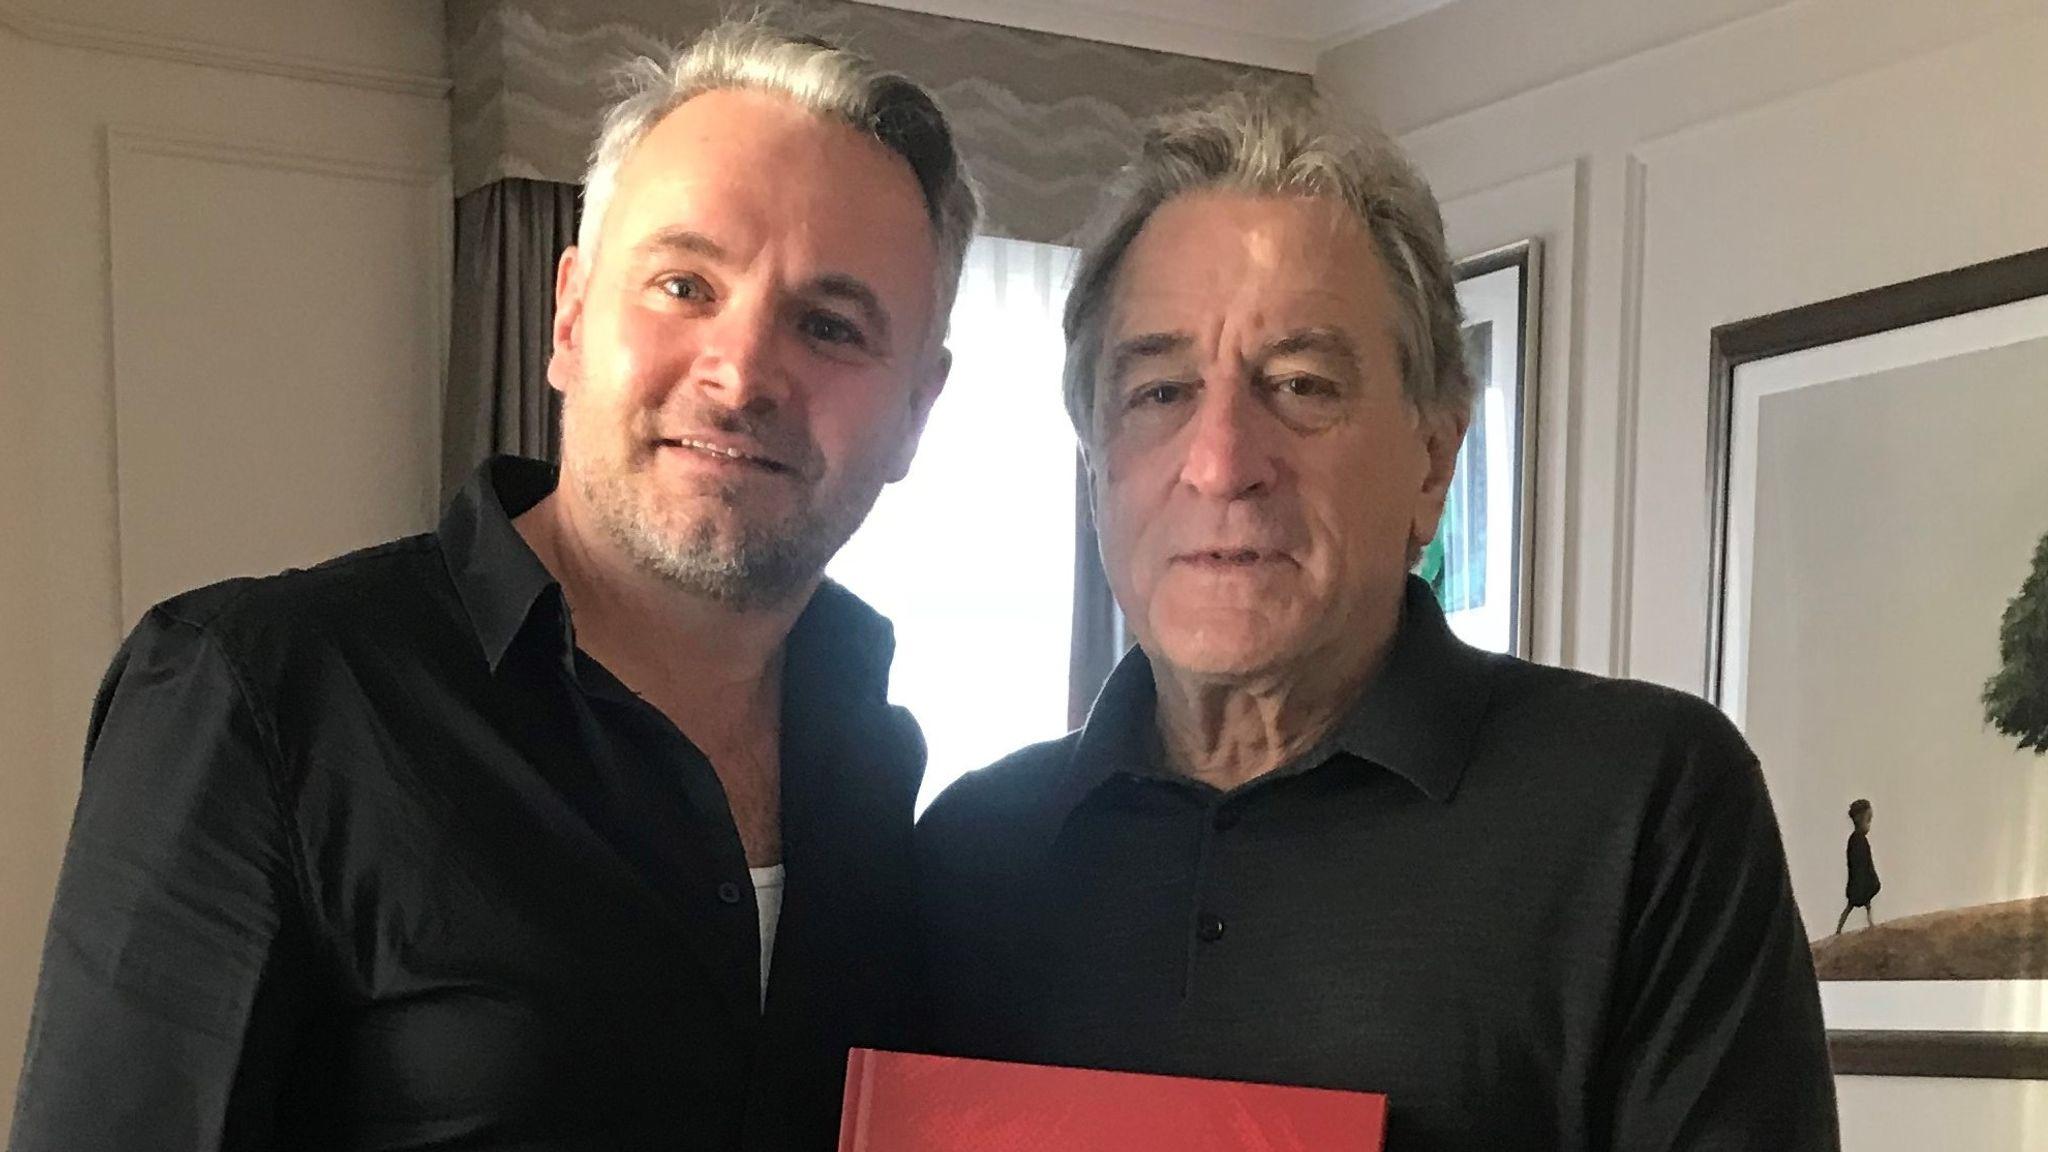 Jay Glennie and Robert De Niro